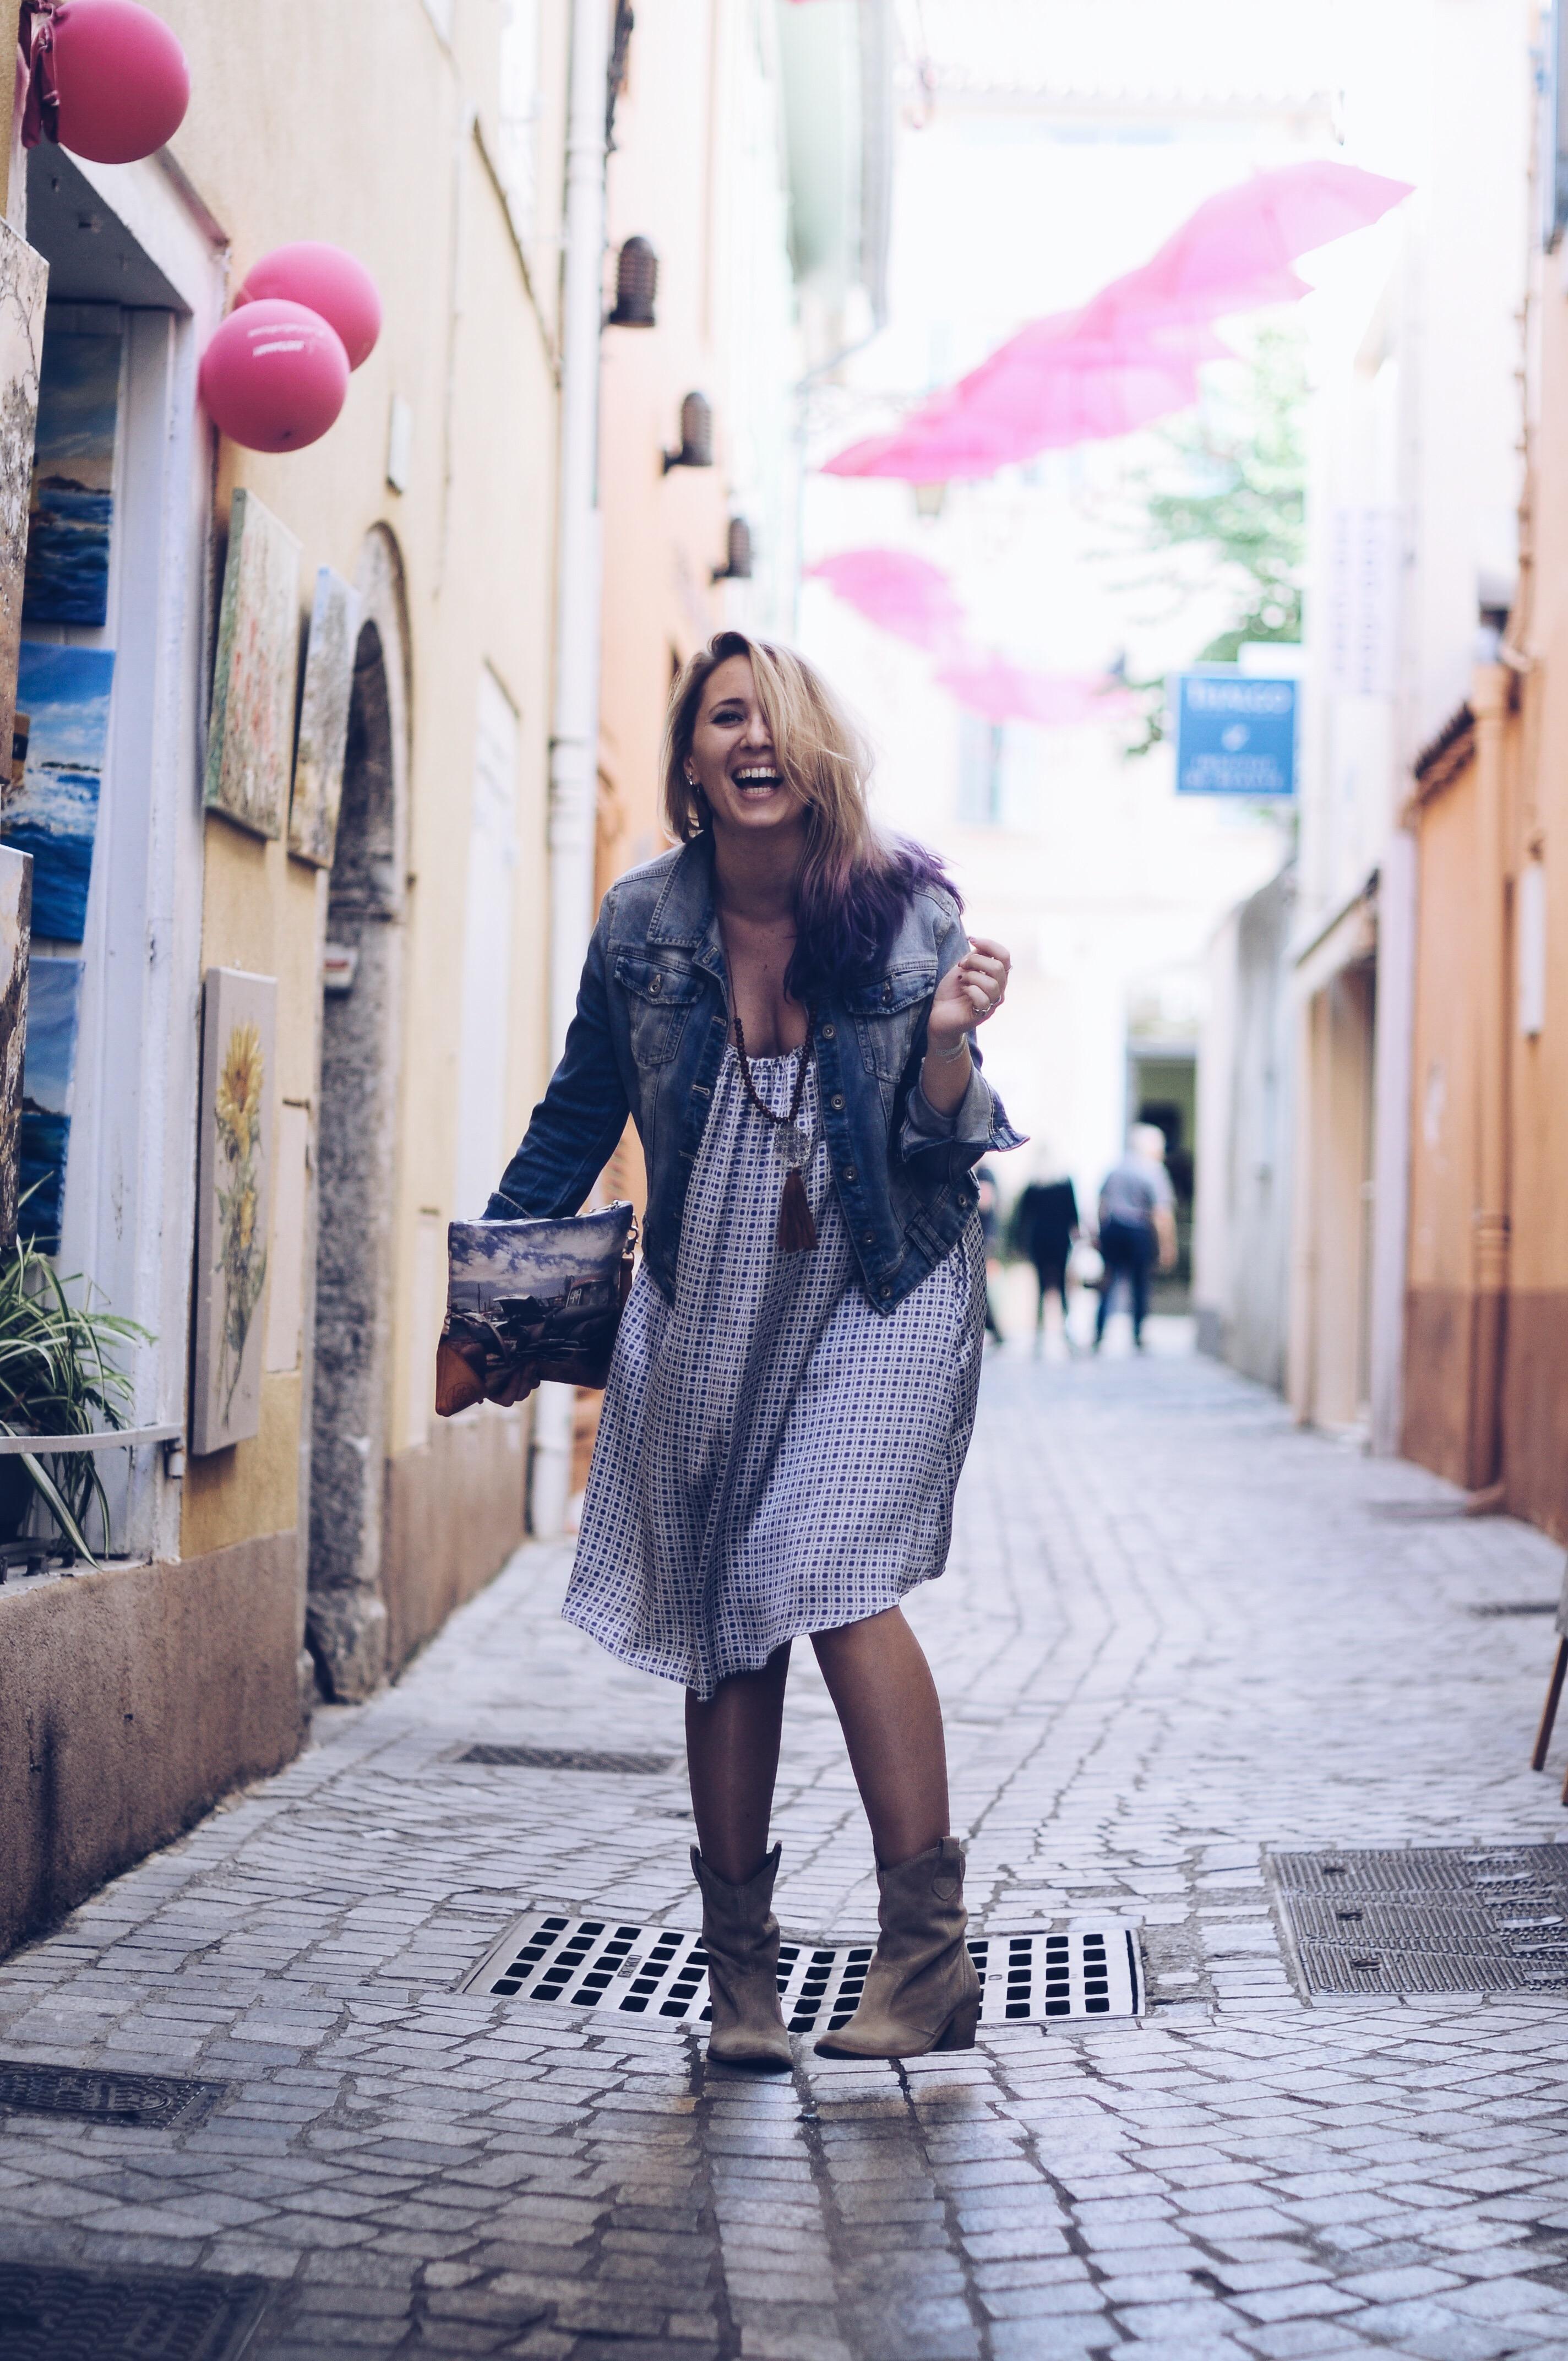 robe Salsa, nomad, primark, ootd, look, style, rêeuse, ethnikk, balabooste, texto